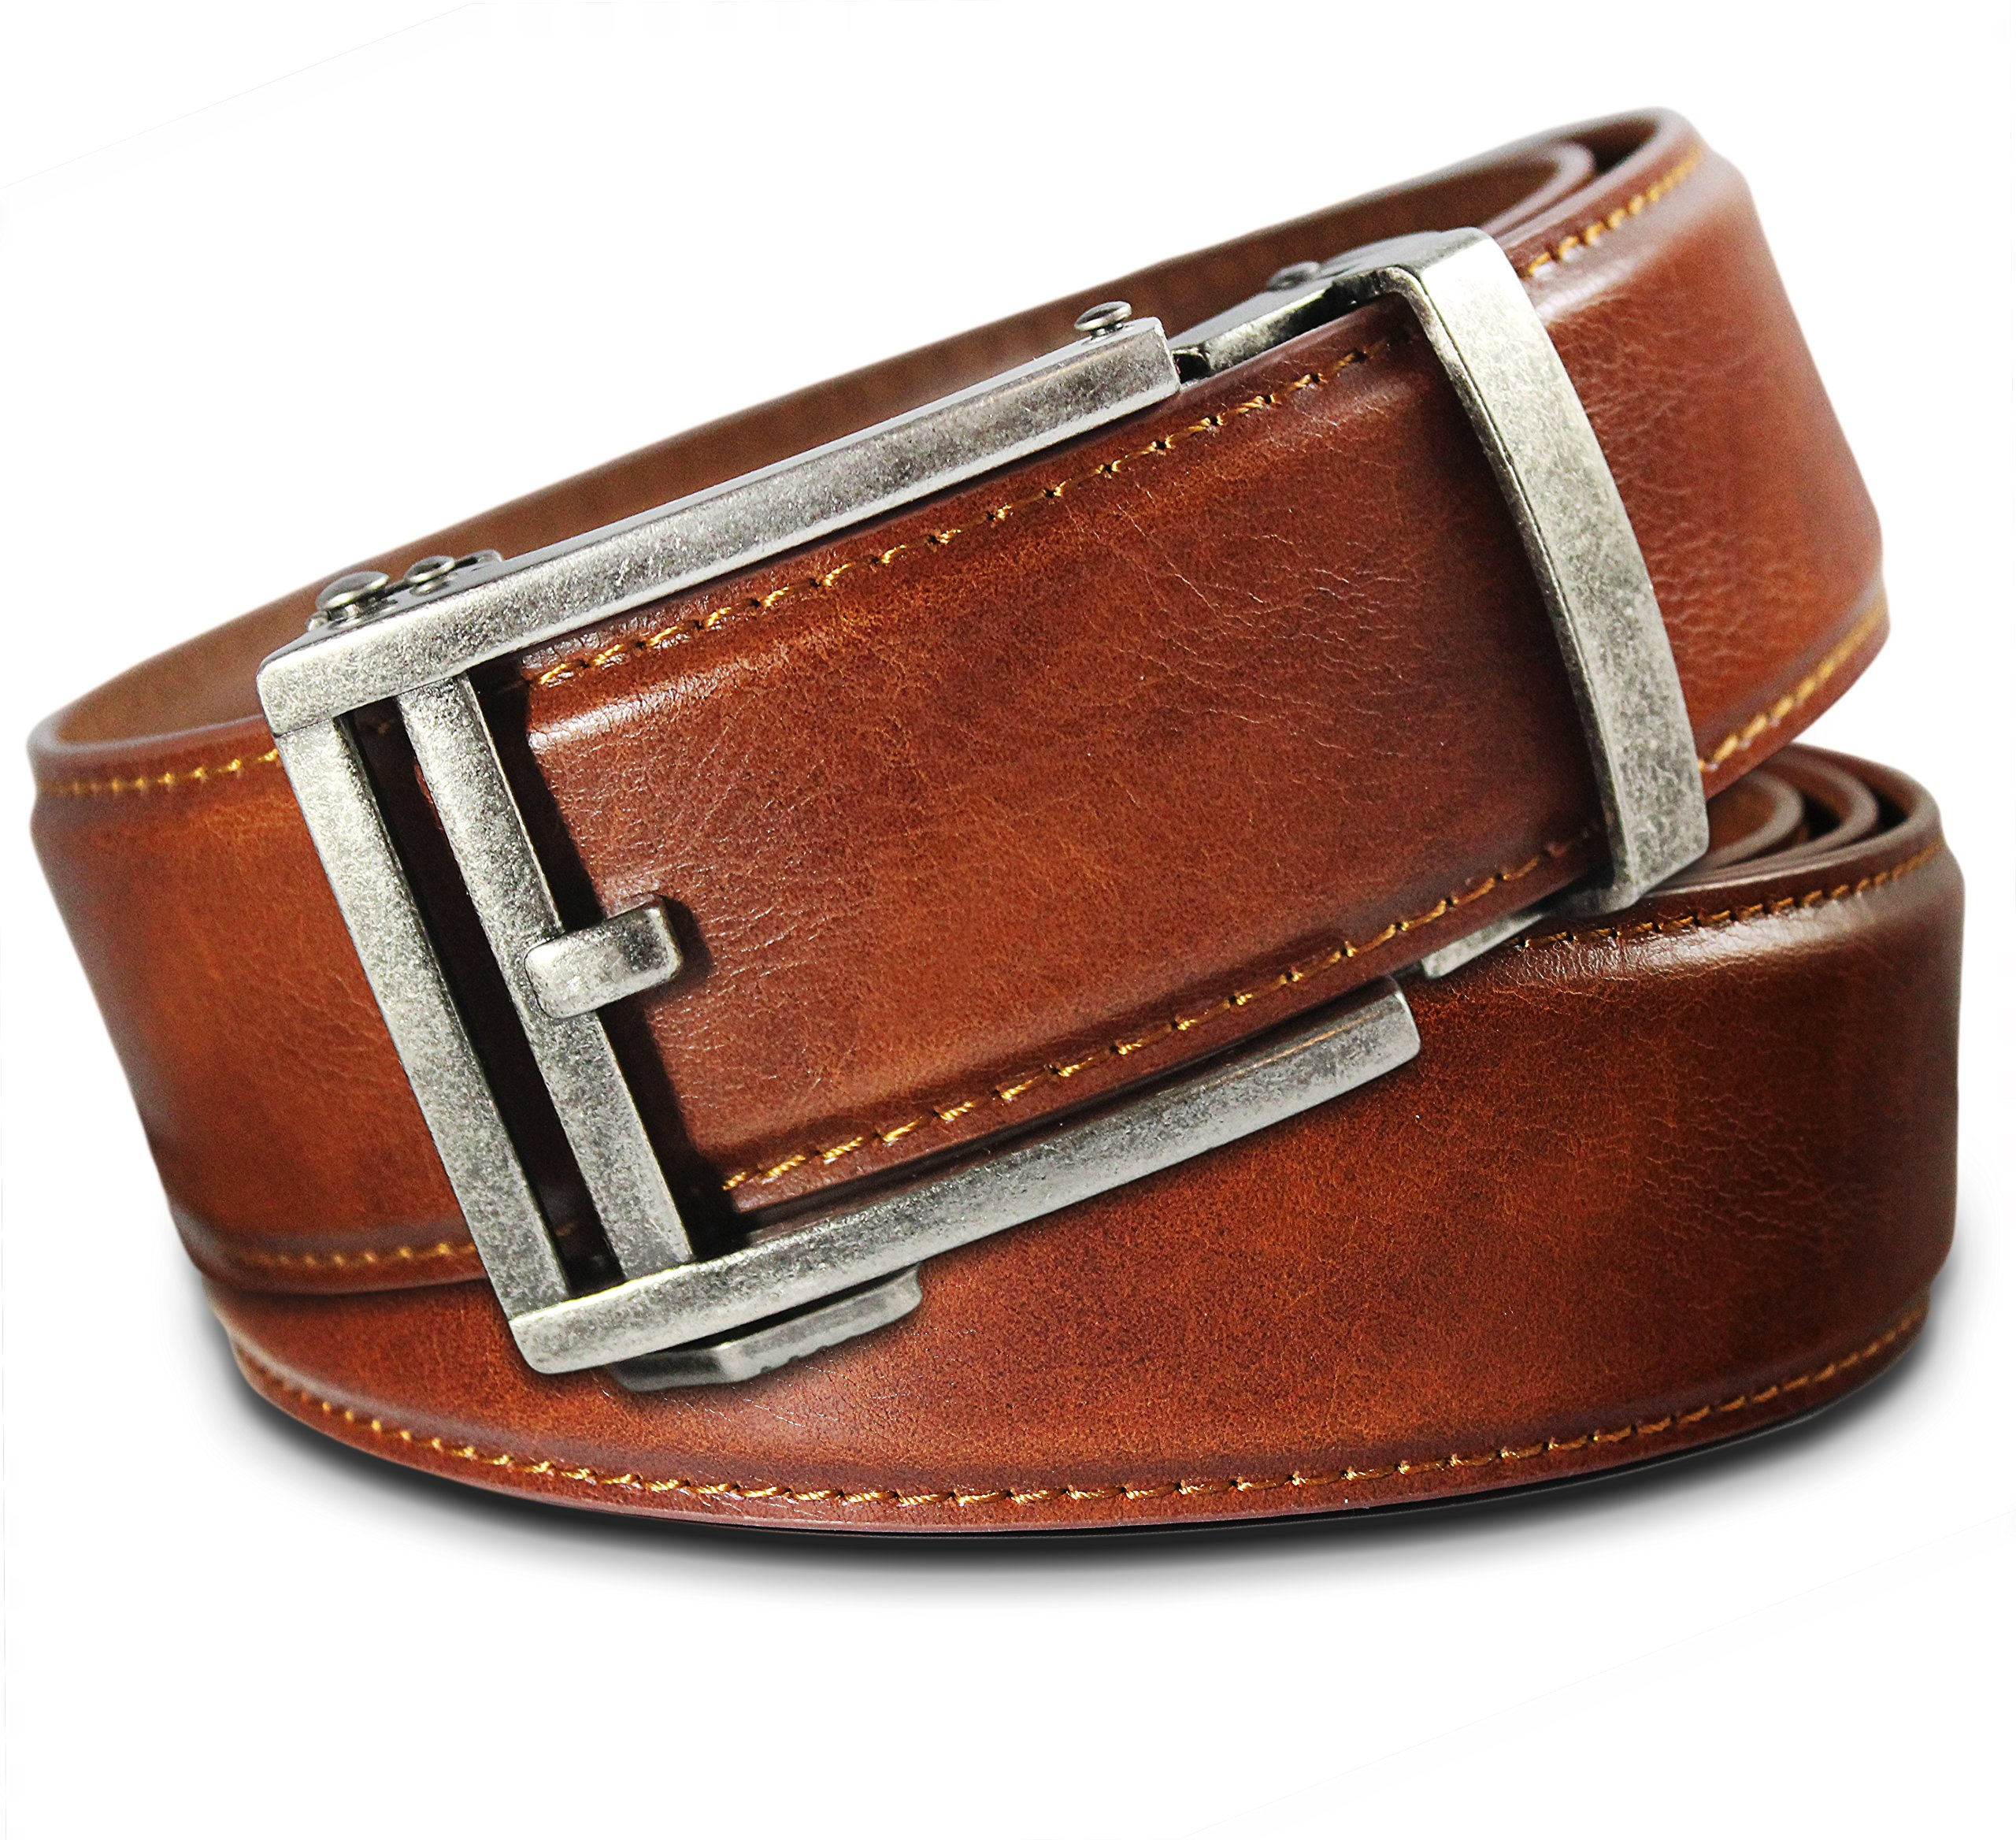 Men's Leather Ratchet Click Belt - Hemingway Antique Silver Buckle w/Saddle Tan Leather Belt (Trim to Fit: Up to 35'' Waist)